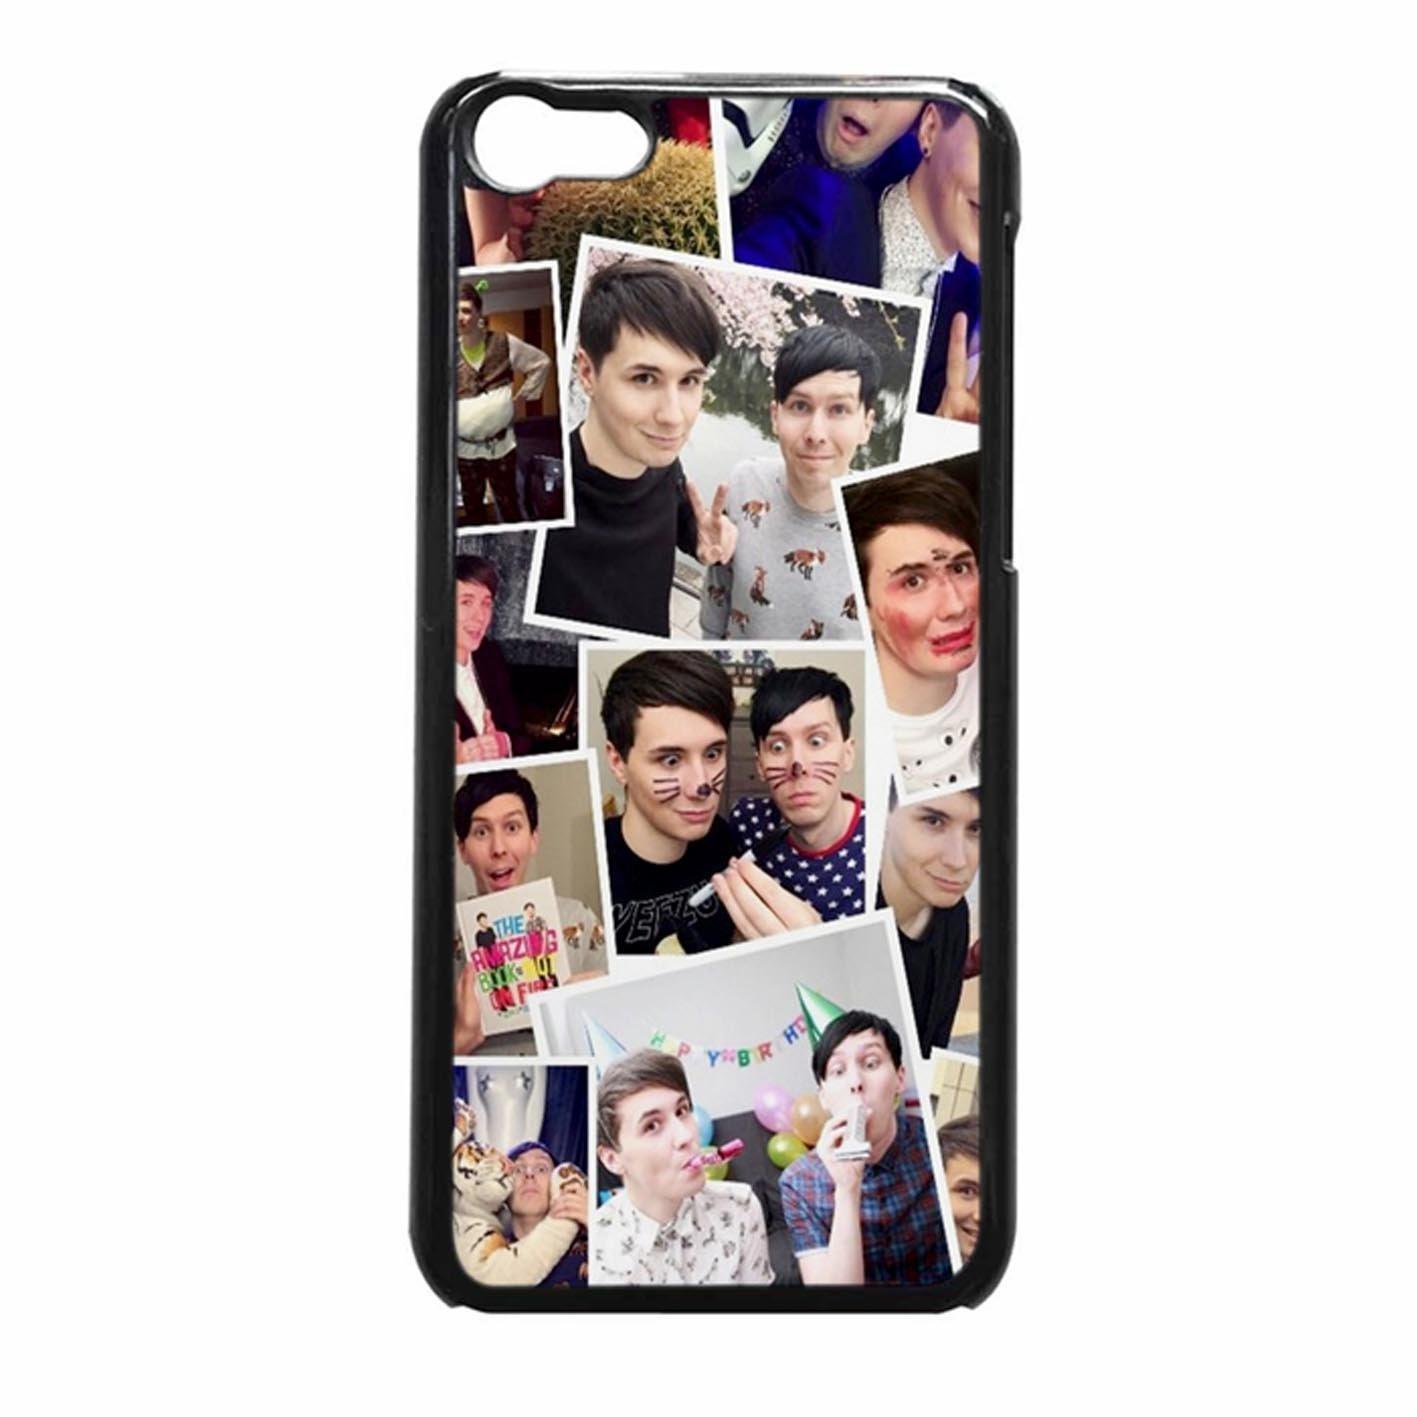 Dan And Phil Photo Collage Case Cover / Color Nero Plastic / Device iPhone 5c